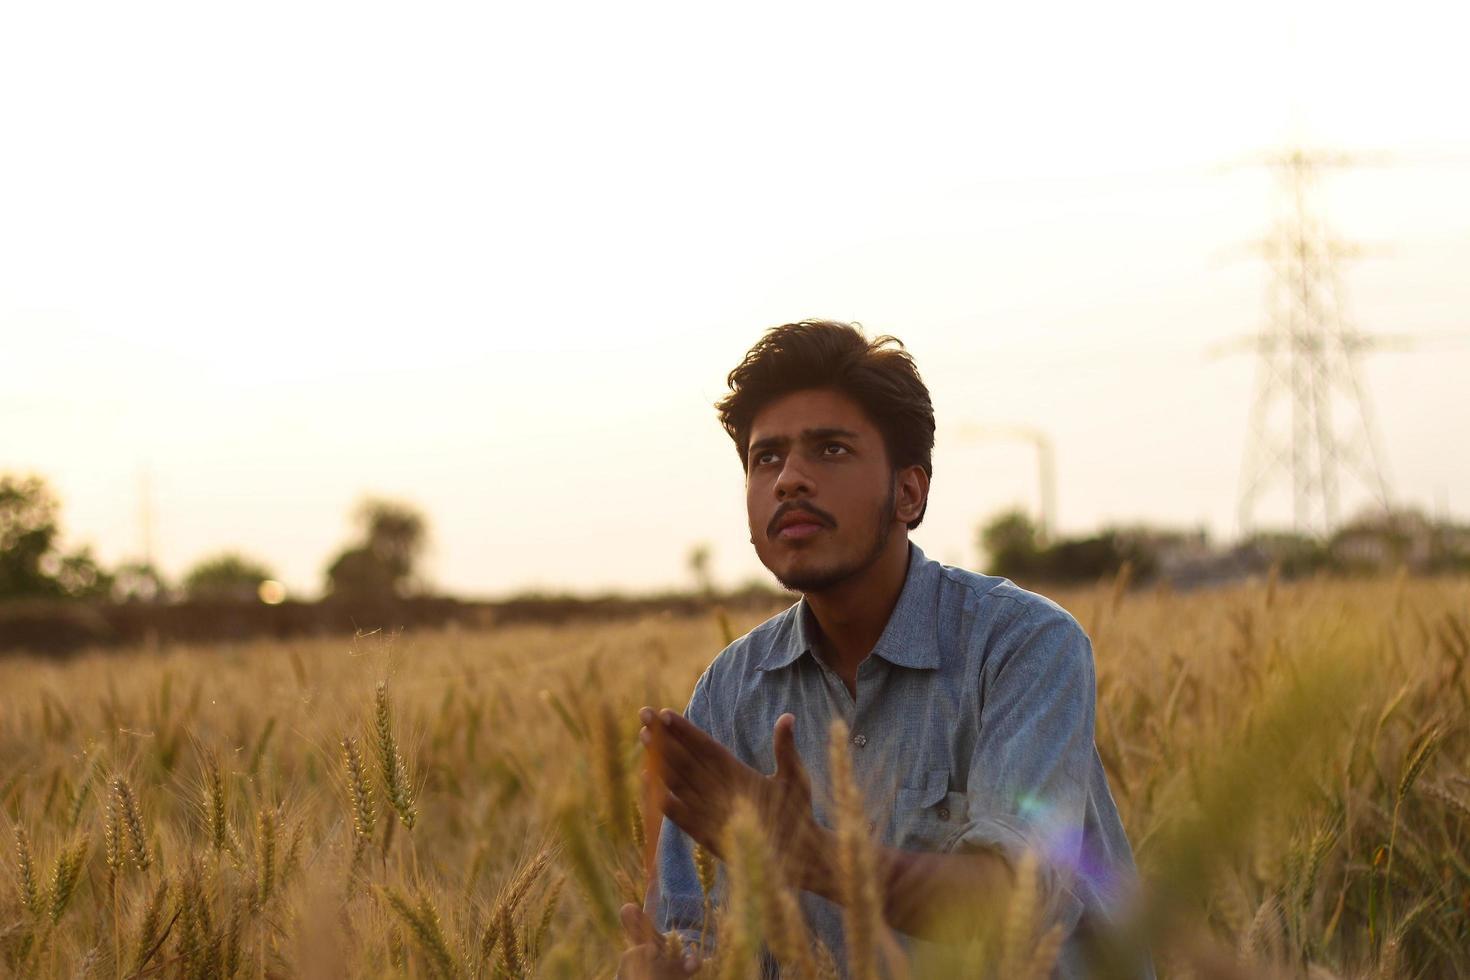 Mann im Weizenfeld foto